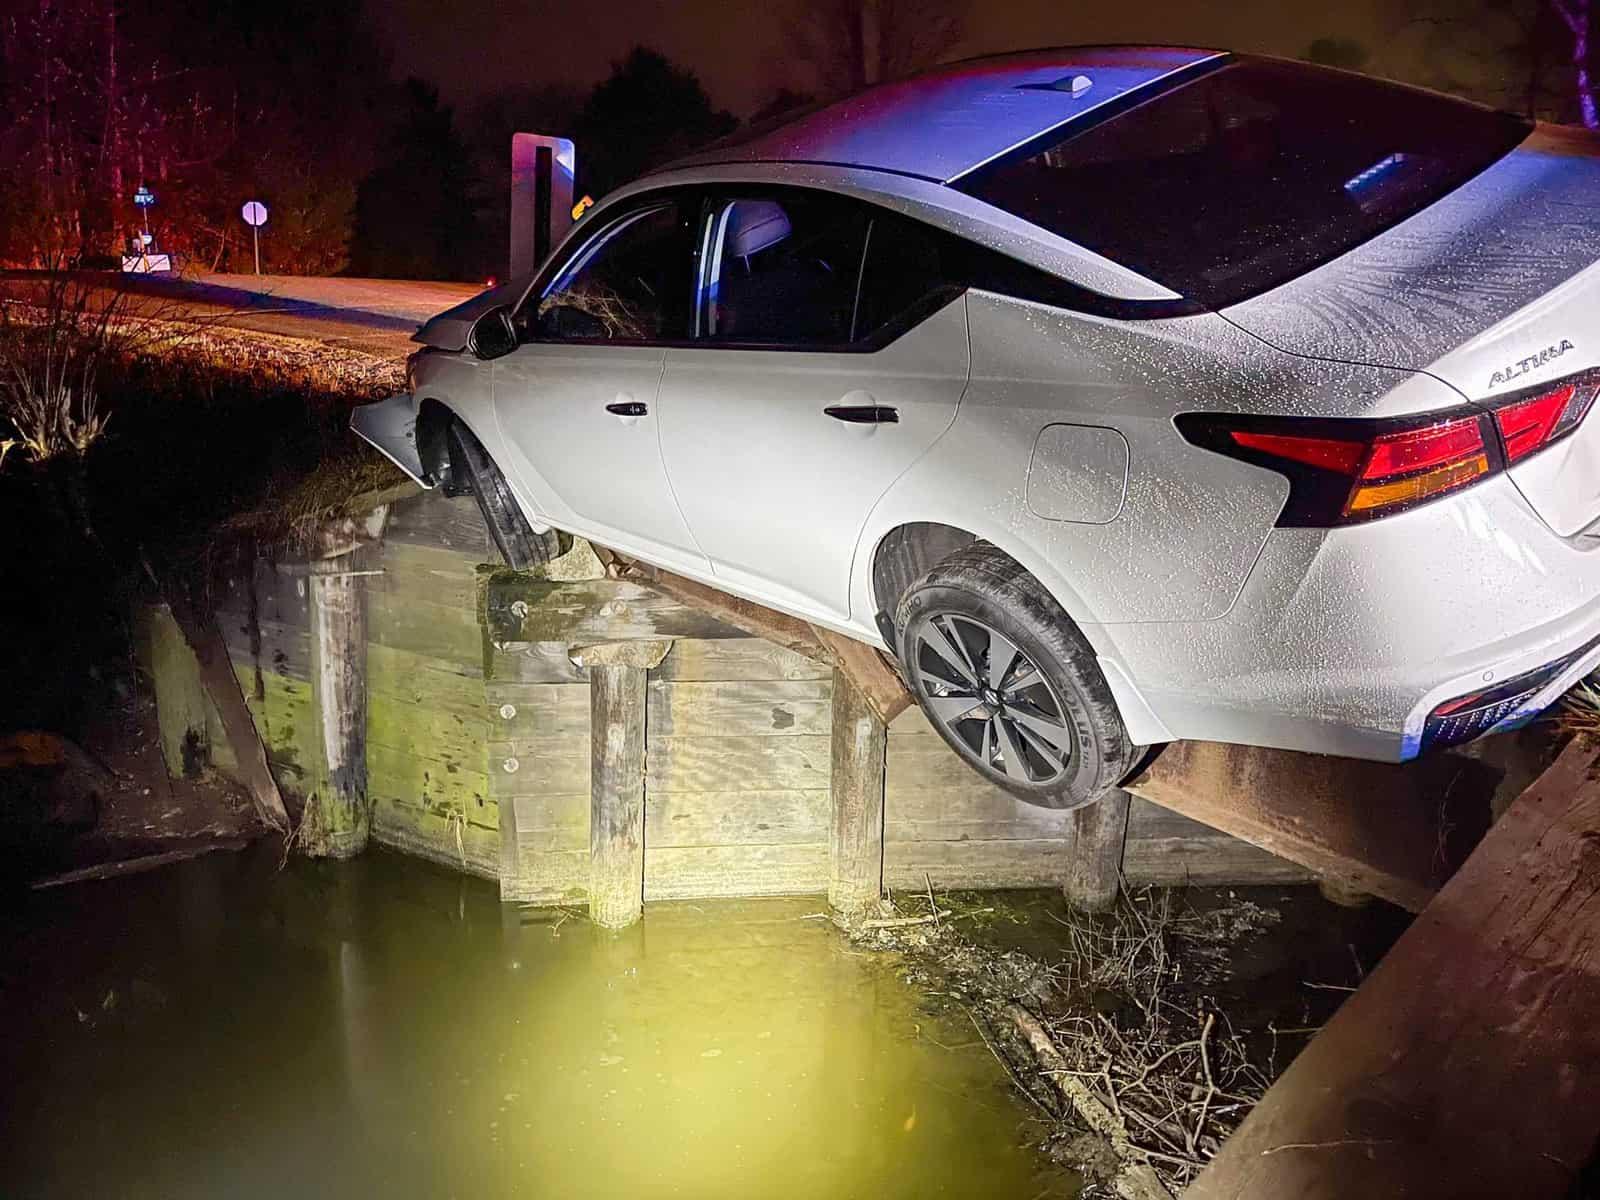 Barron county sheriff drunk driving